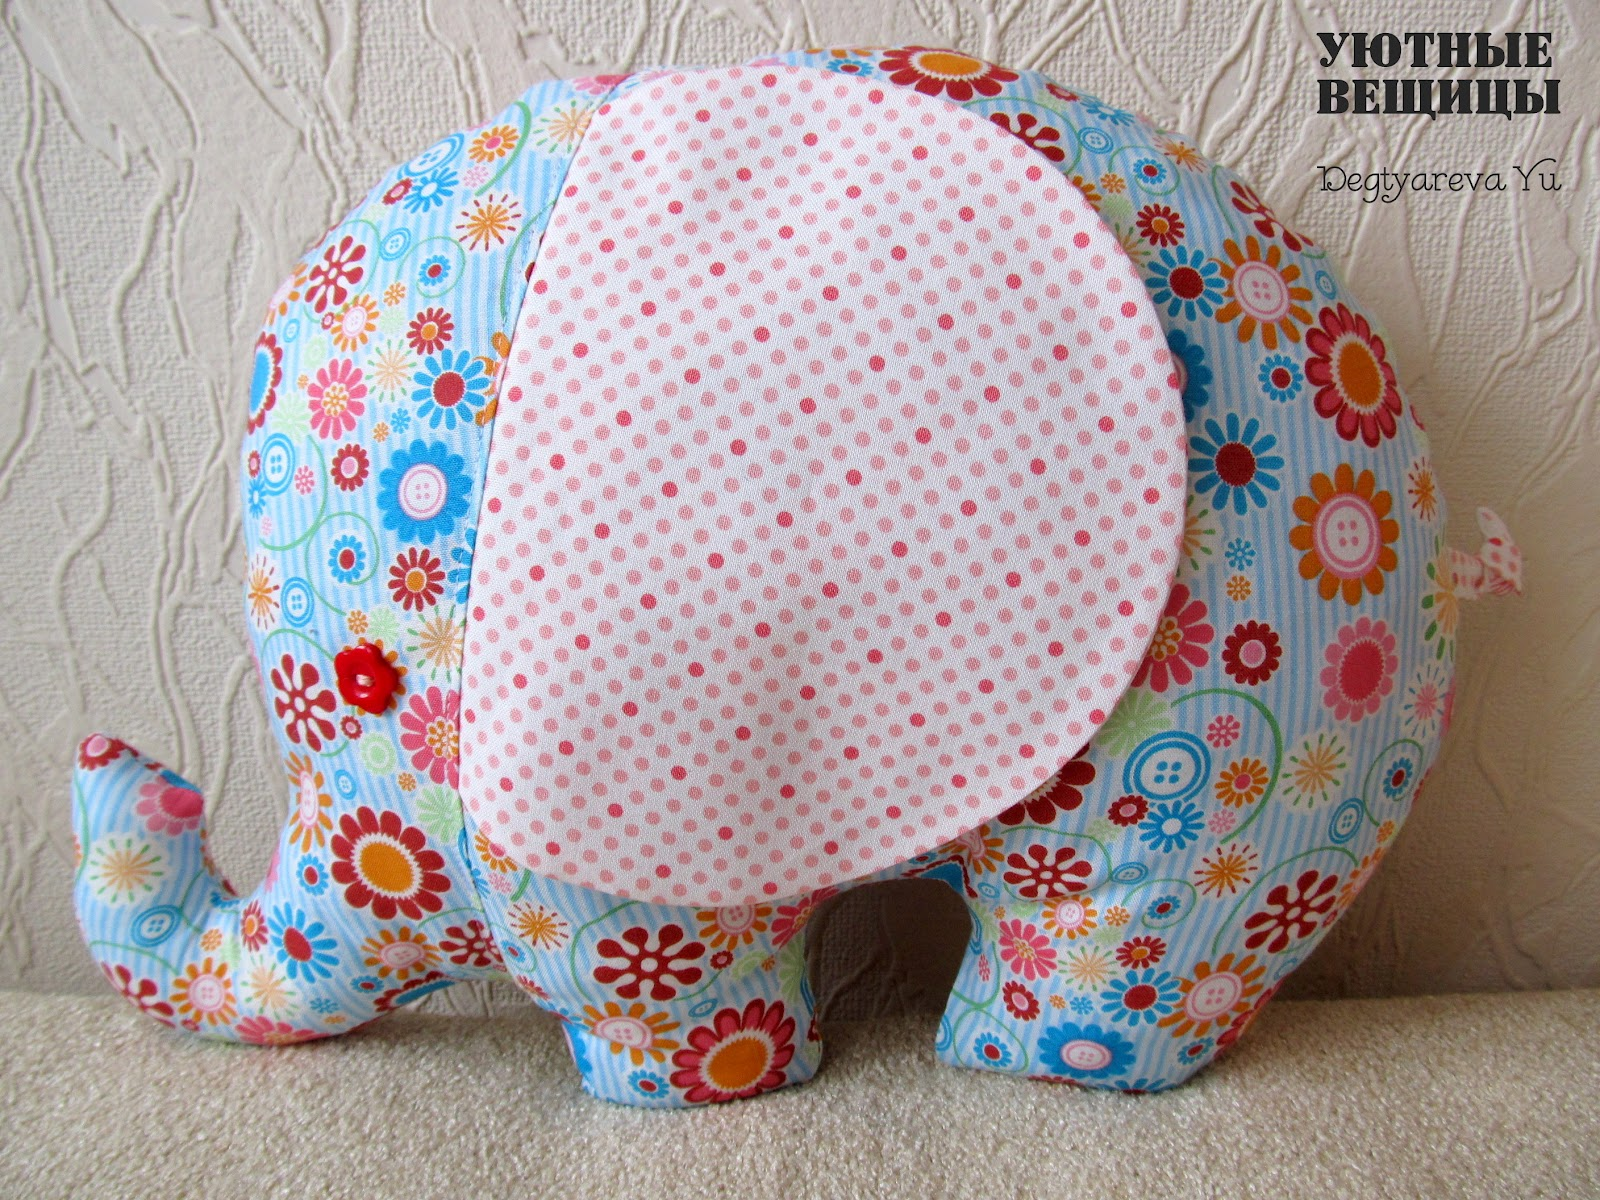 Подушка-слон своими руками 7